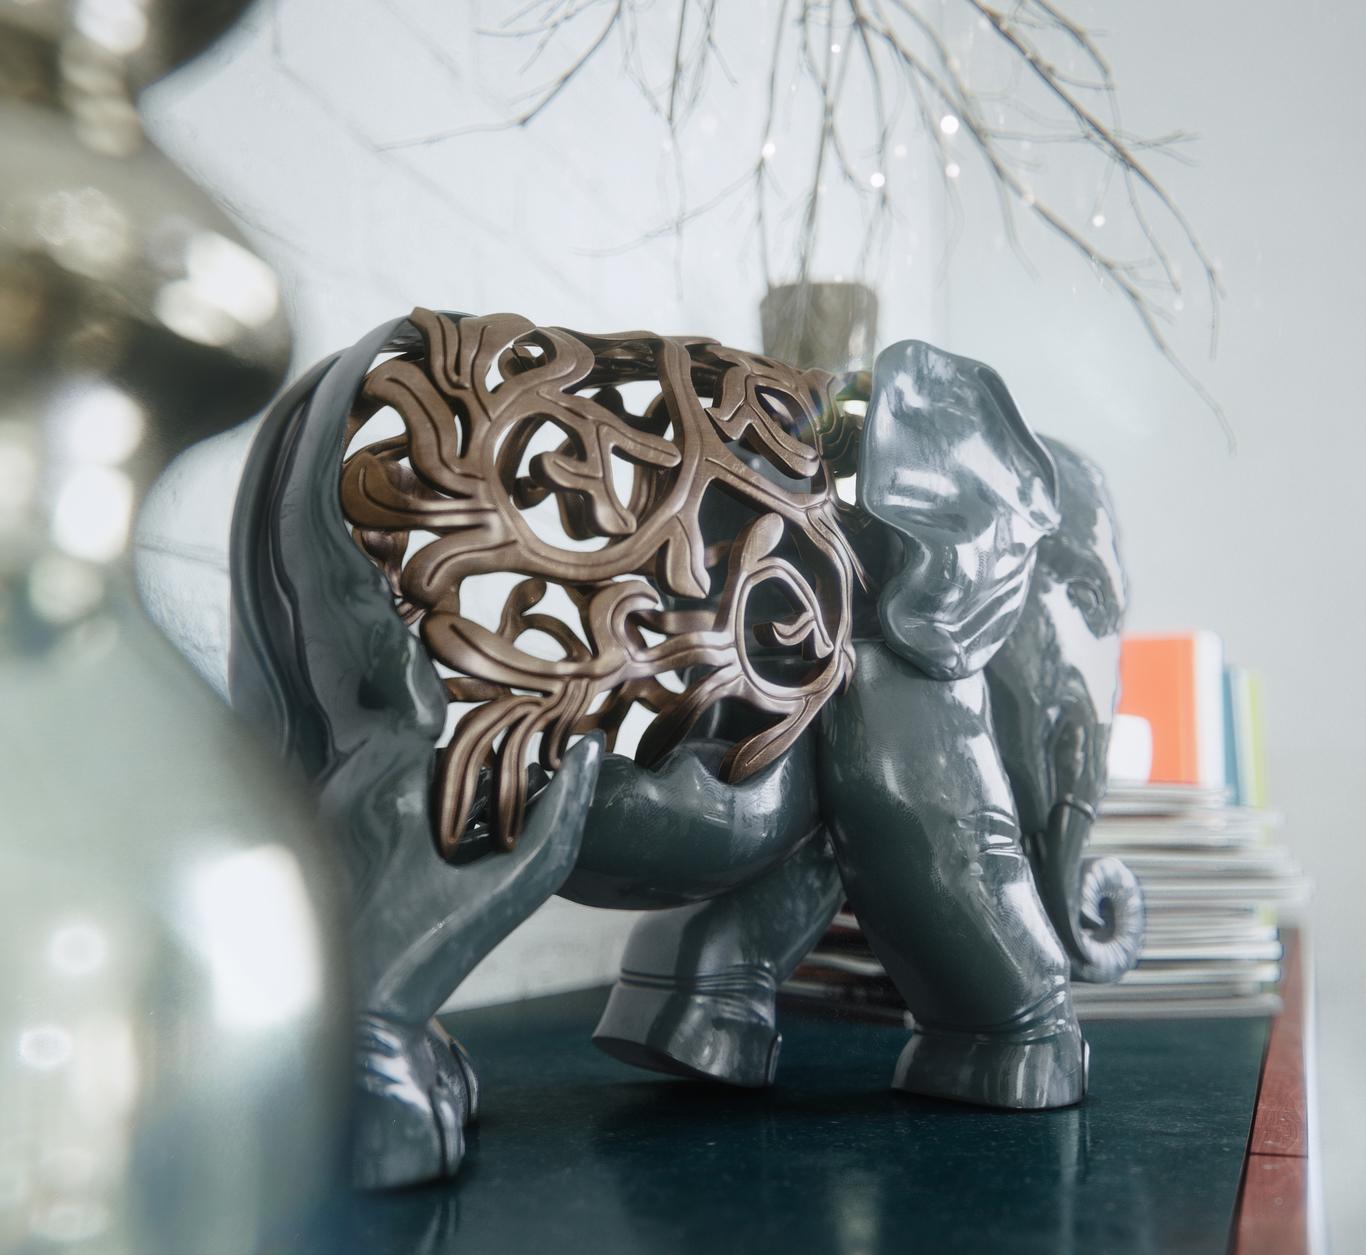 Him3 the elephant 1 1980e5e1 ebfj